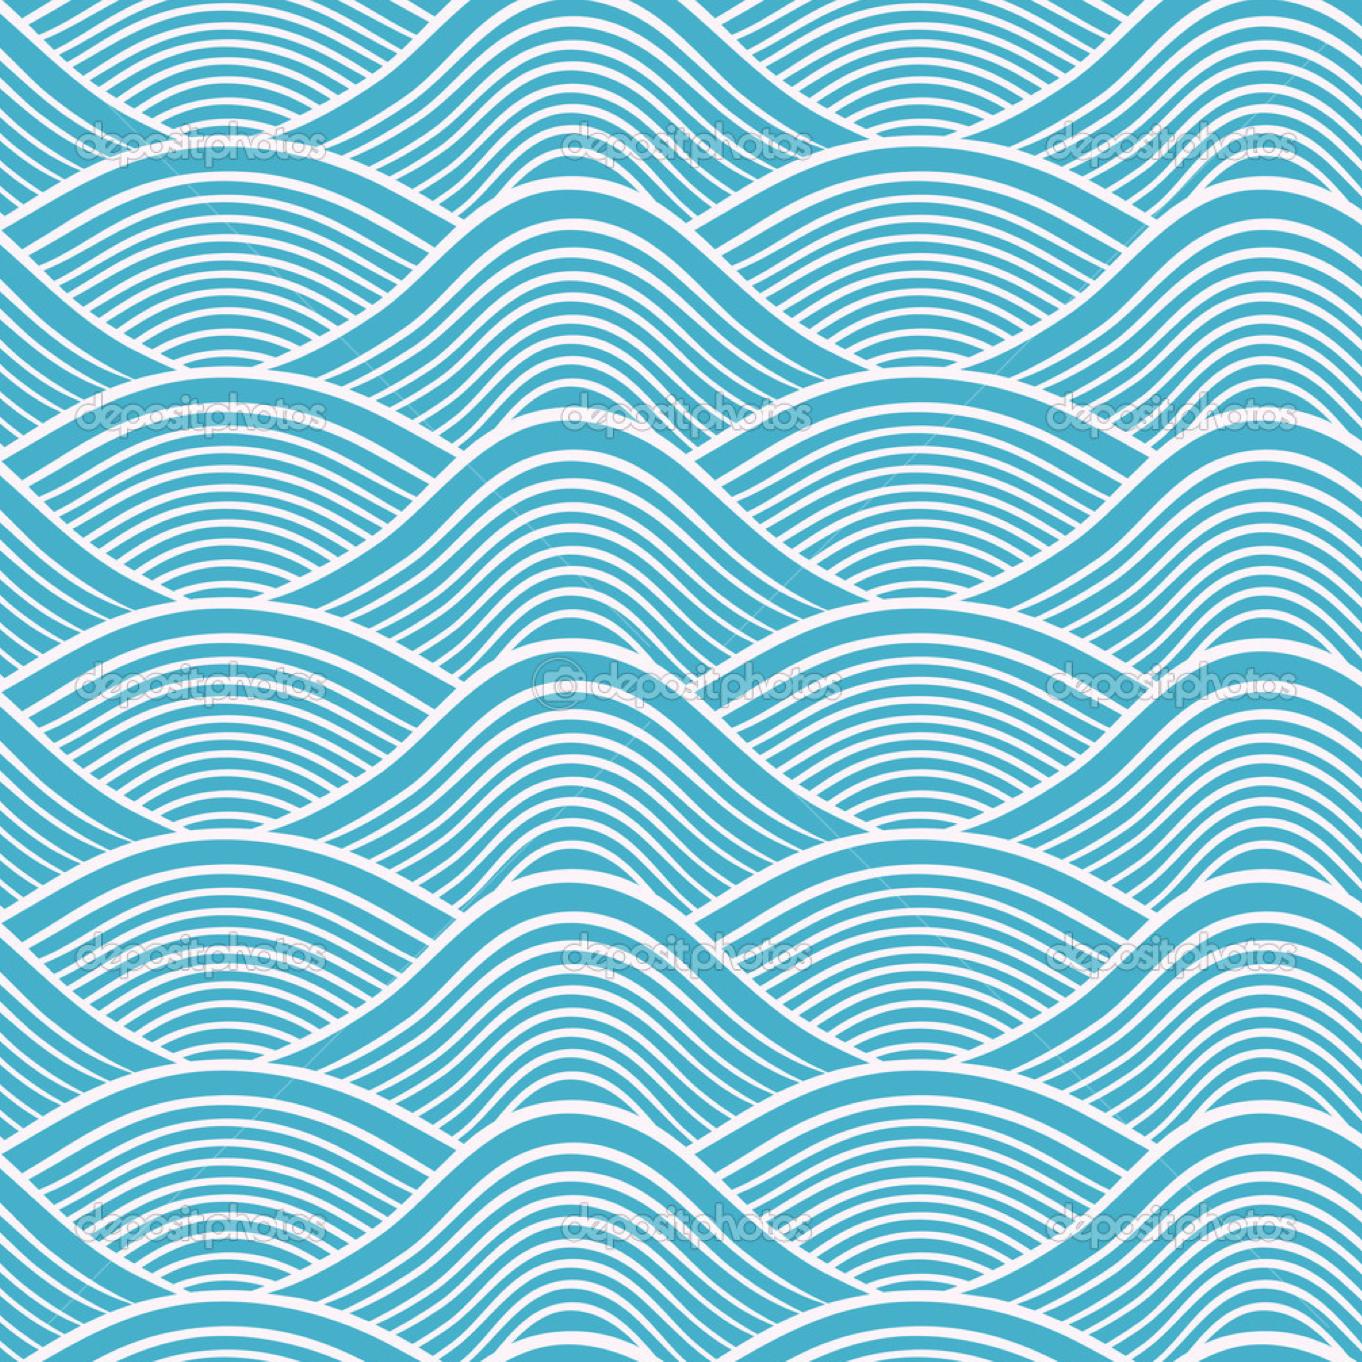 water pattern   Japanese waves, Japanese patterns, Wave ...